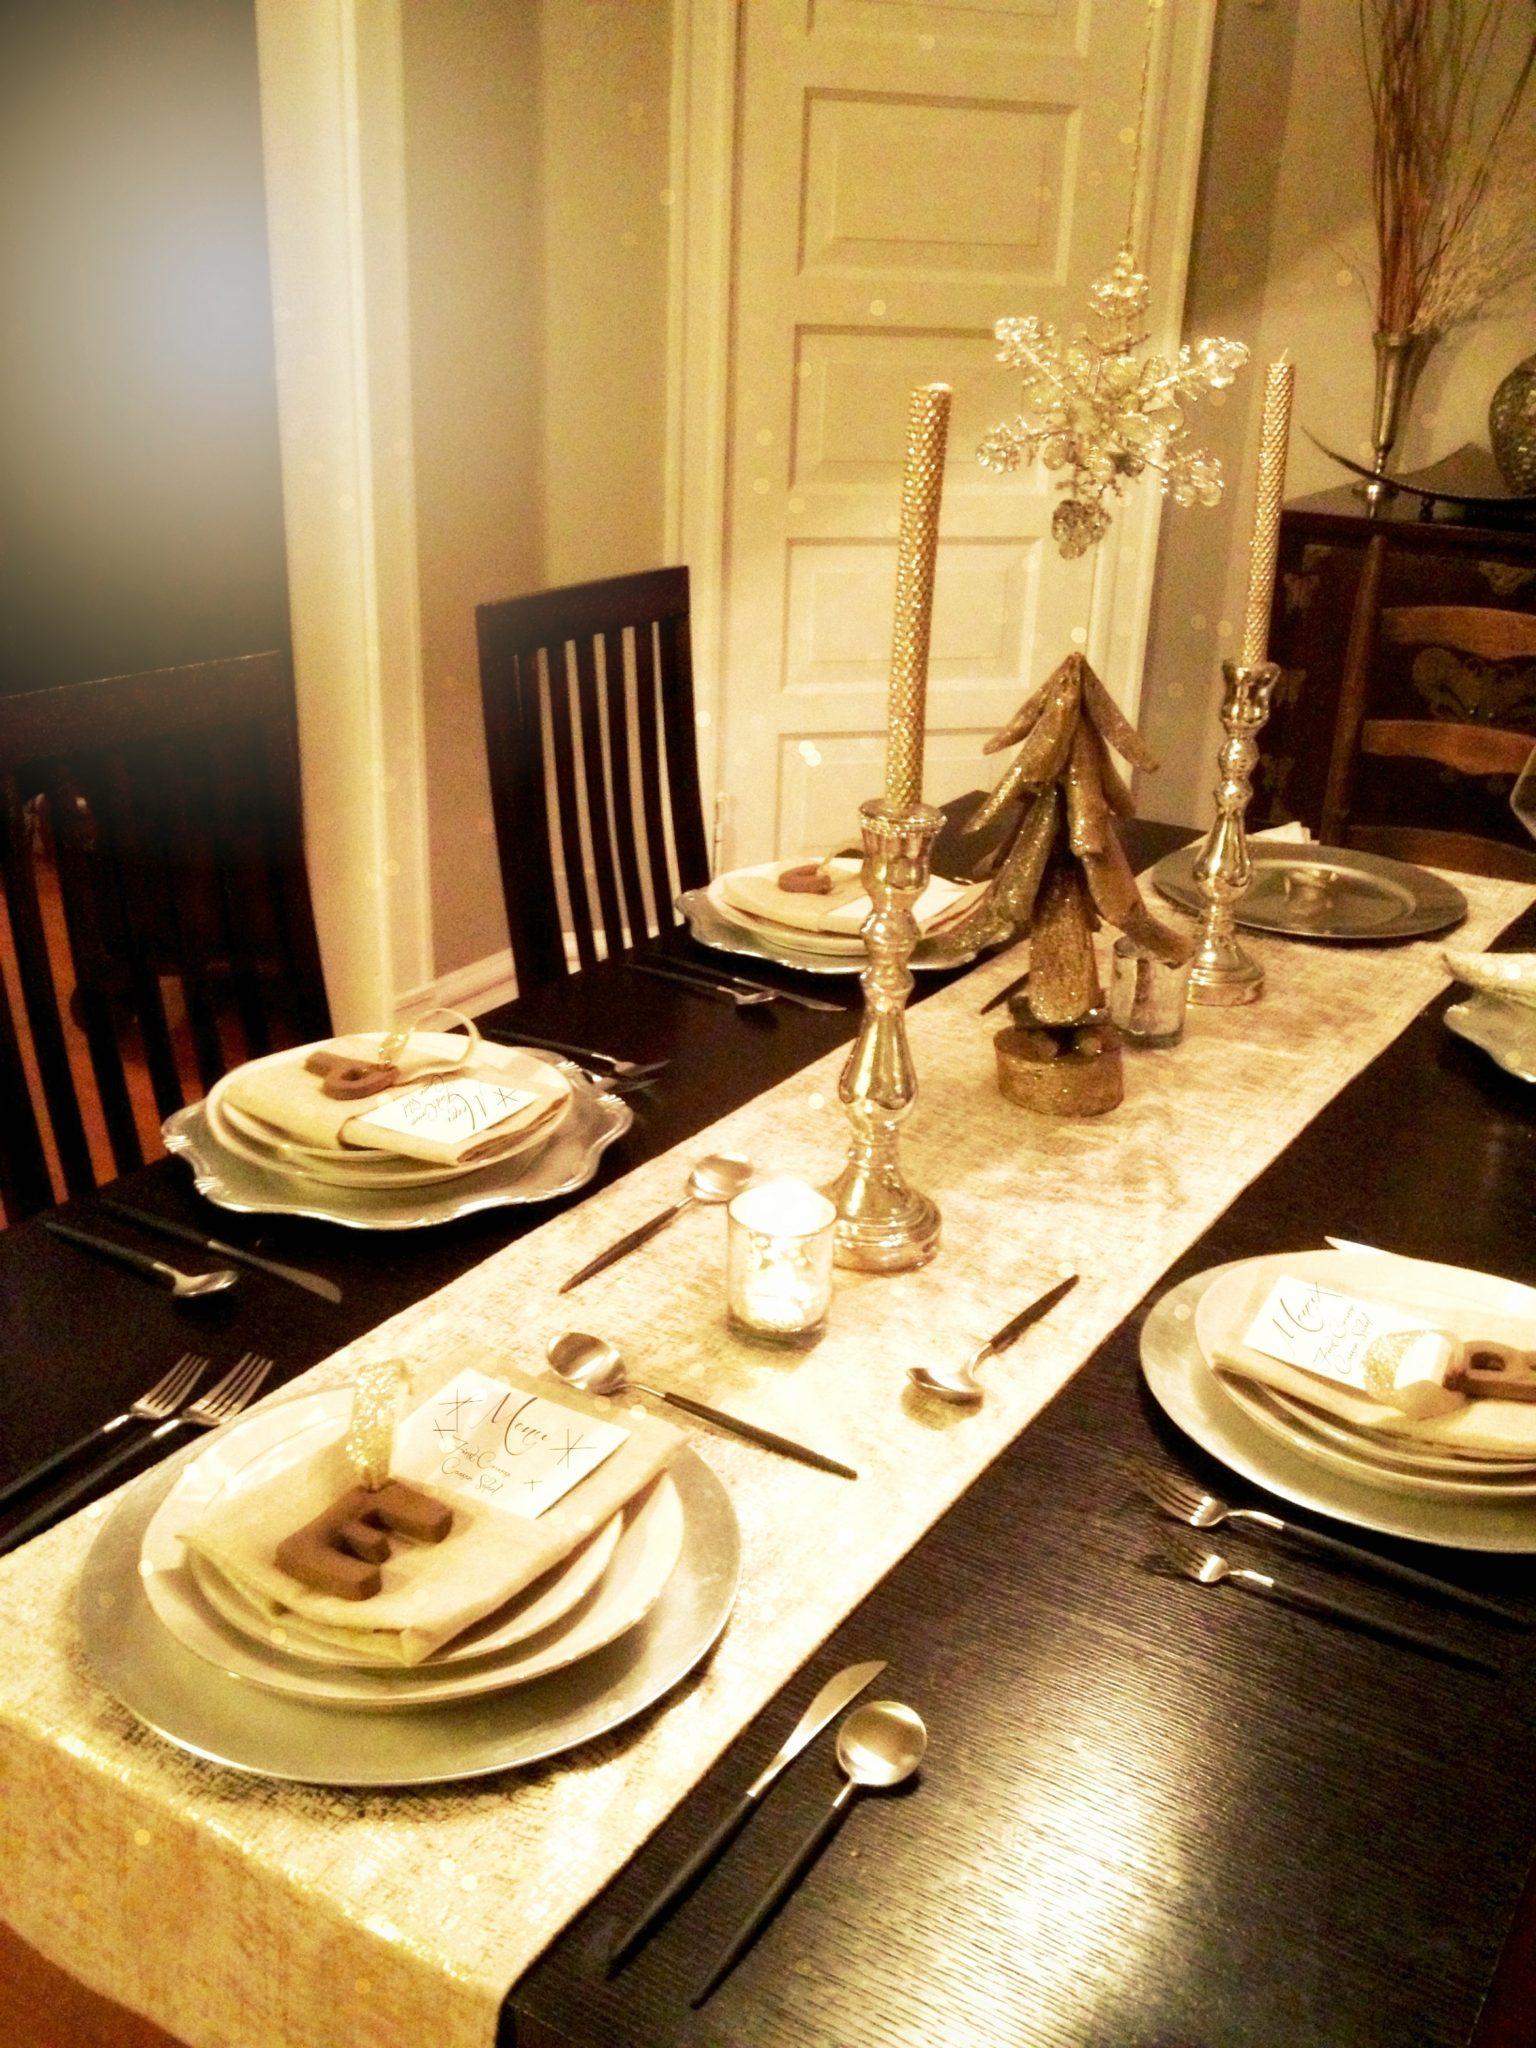 Holiday Table Setting Ideas + Tips - Clean Cuisine